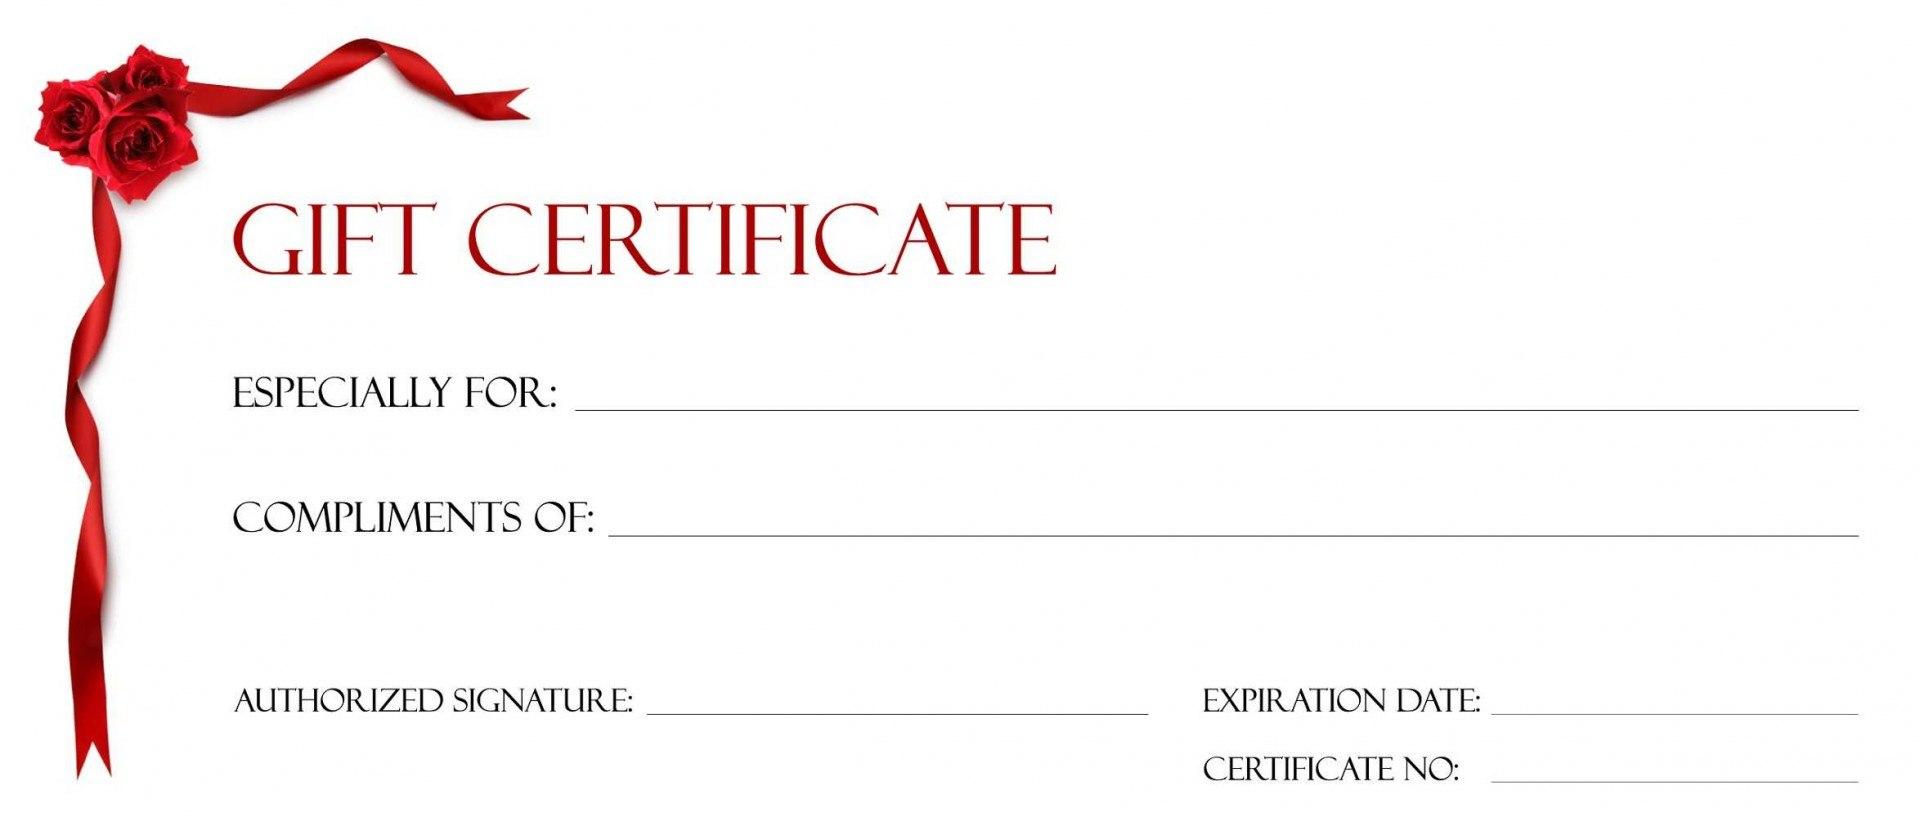 Template Ideas Custom Gift Certificate Unique Card Word Coloring With Custom Gift Certificate Template